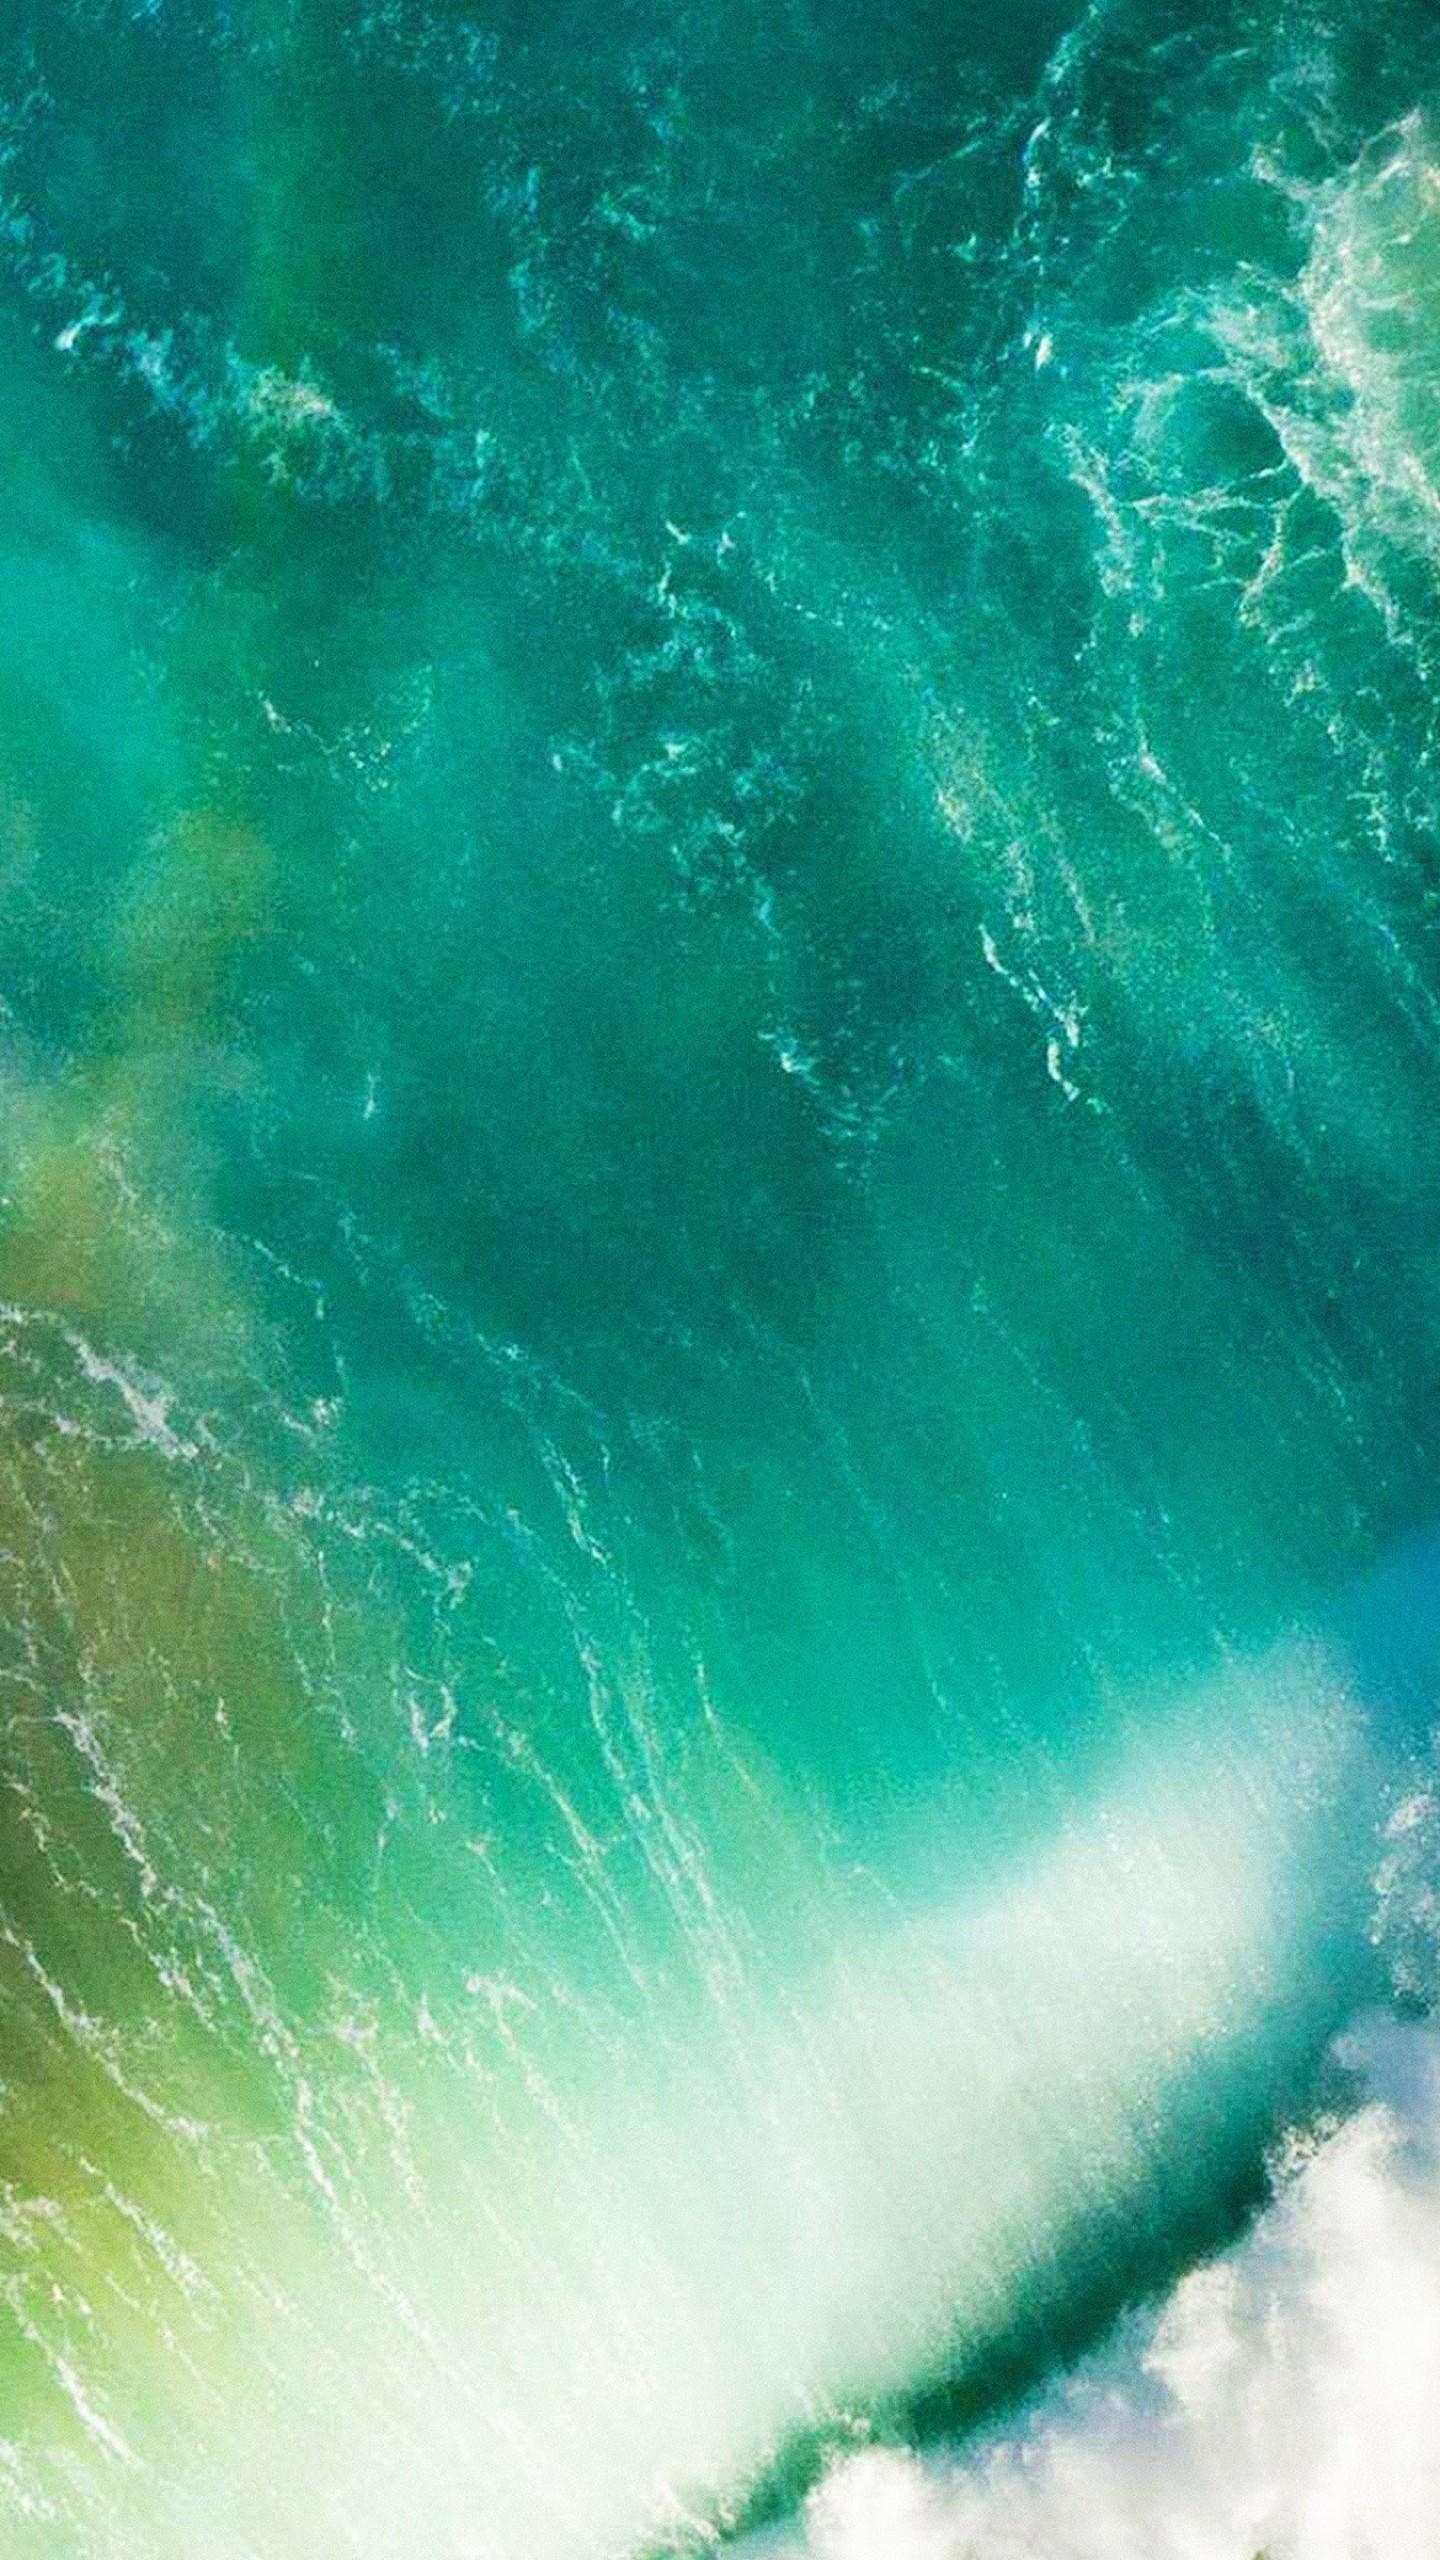 Wallpaper Apple iOS 10 4k 5k iphone wallpaper live wallpaper 1440x2560